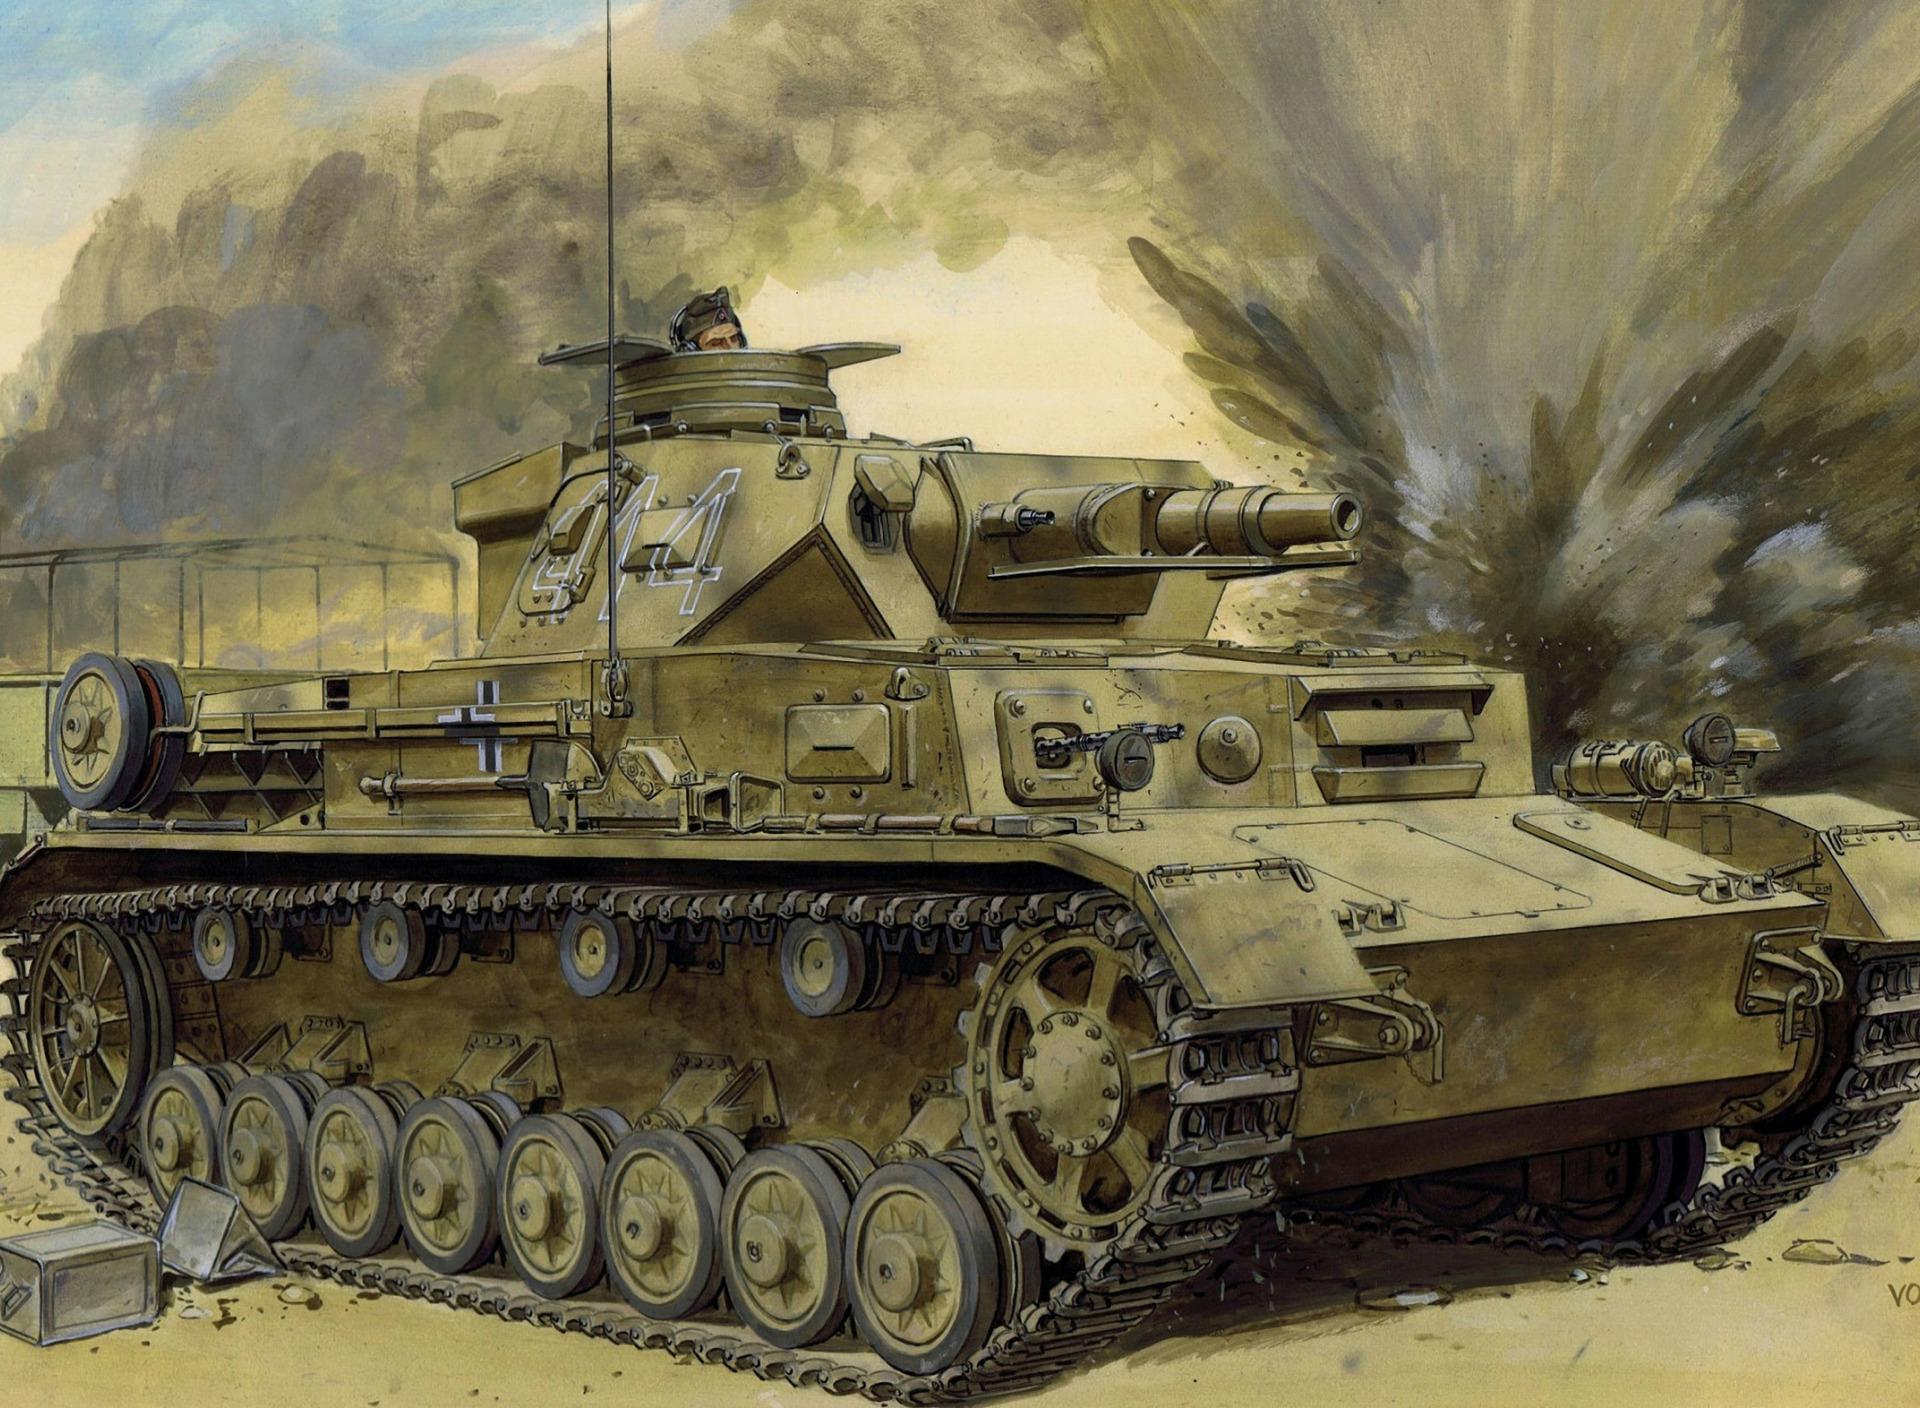 Танк немецкий картинка рисунок